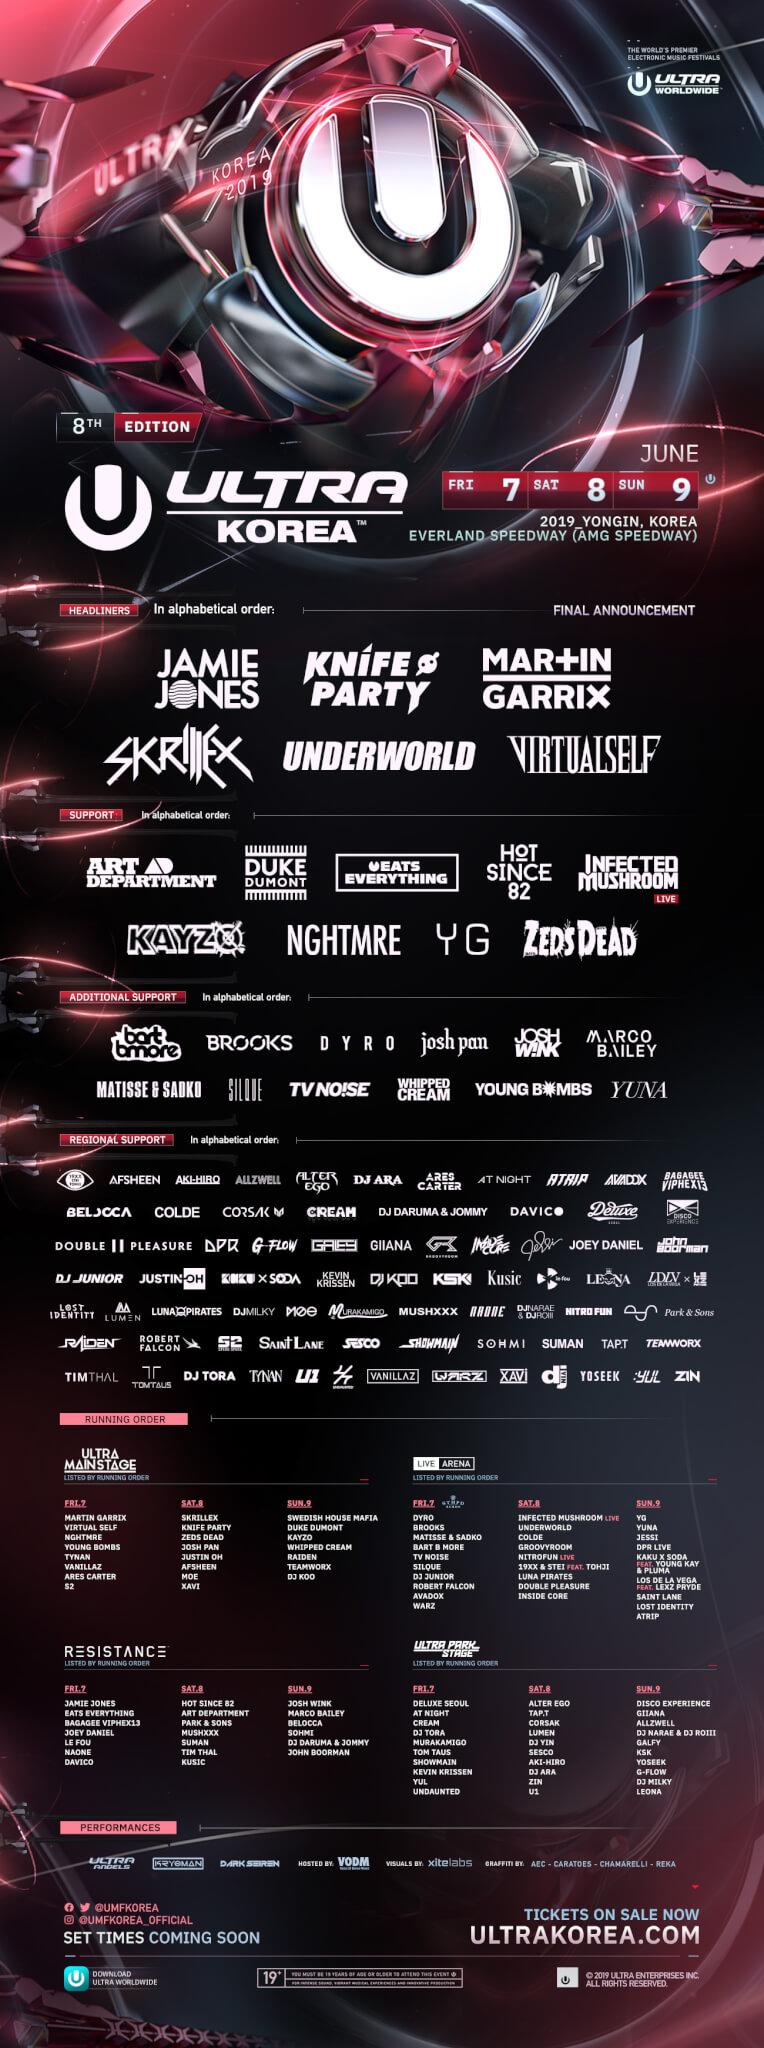 ULTRA Korea, Asia's largest EDM festival to kick off June 7